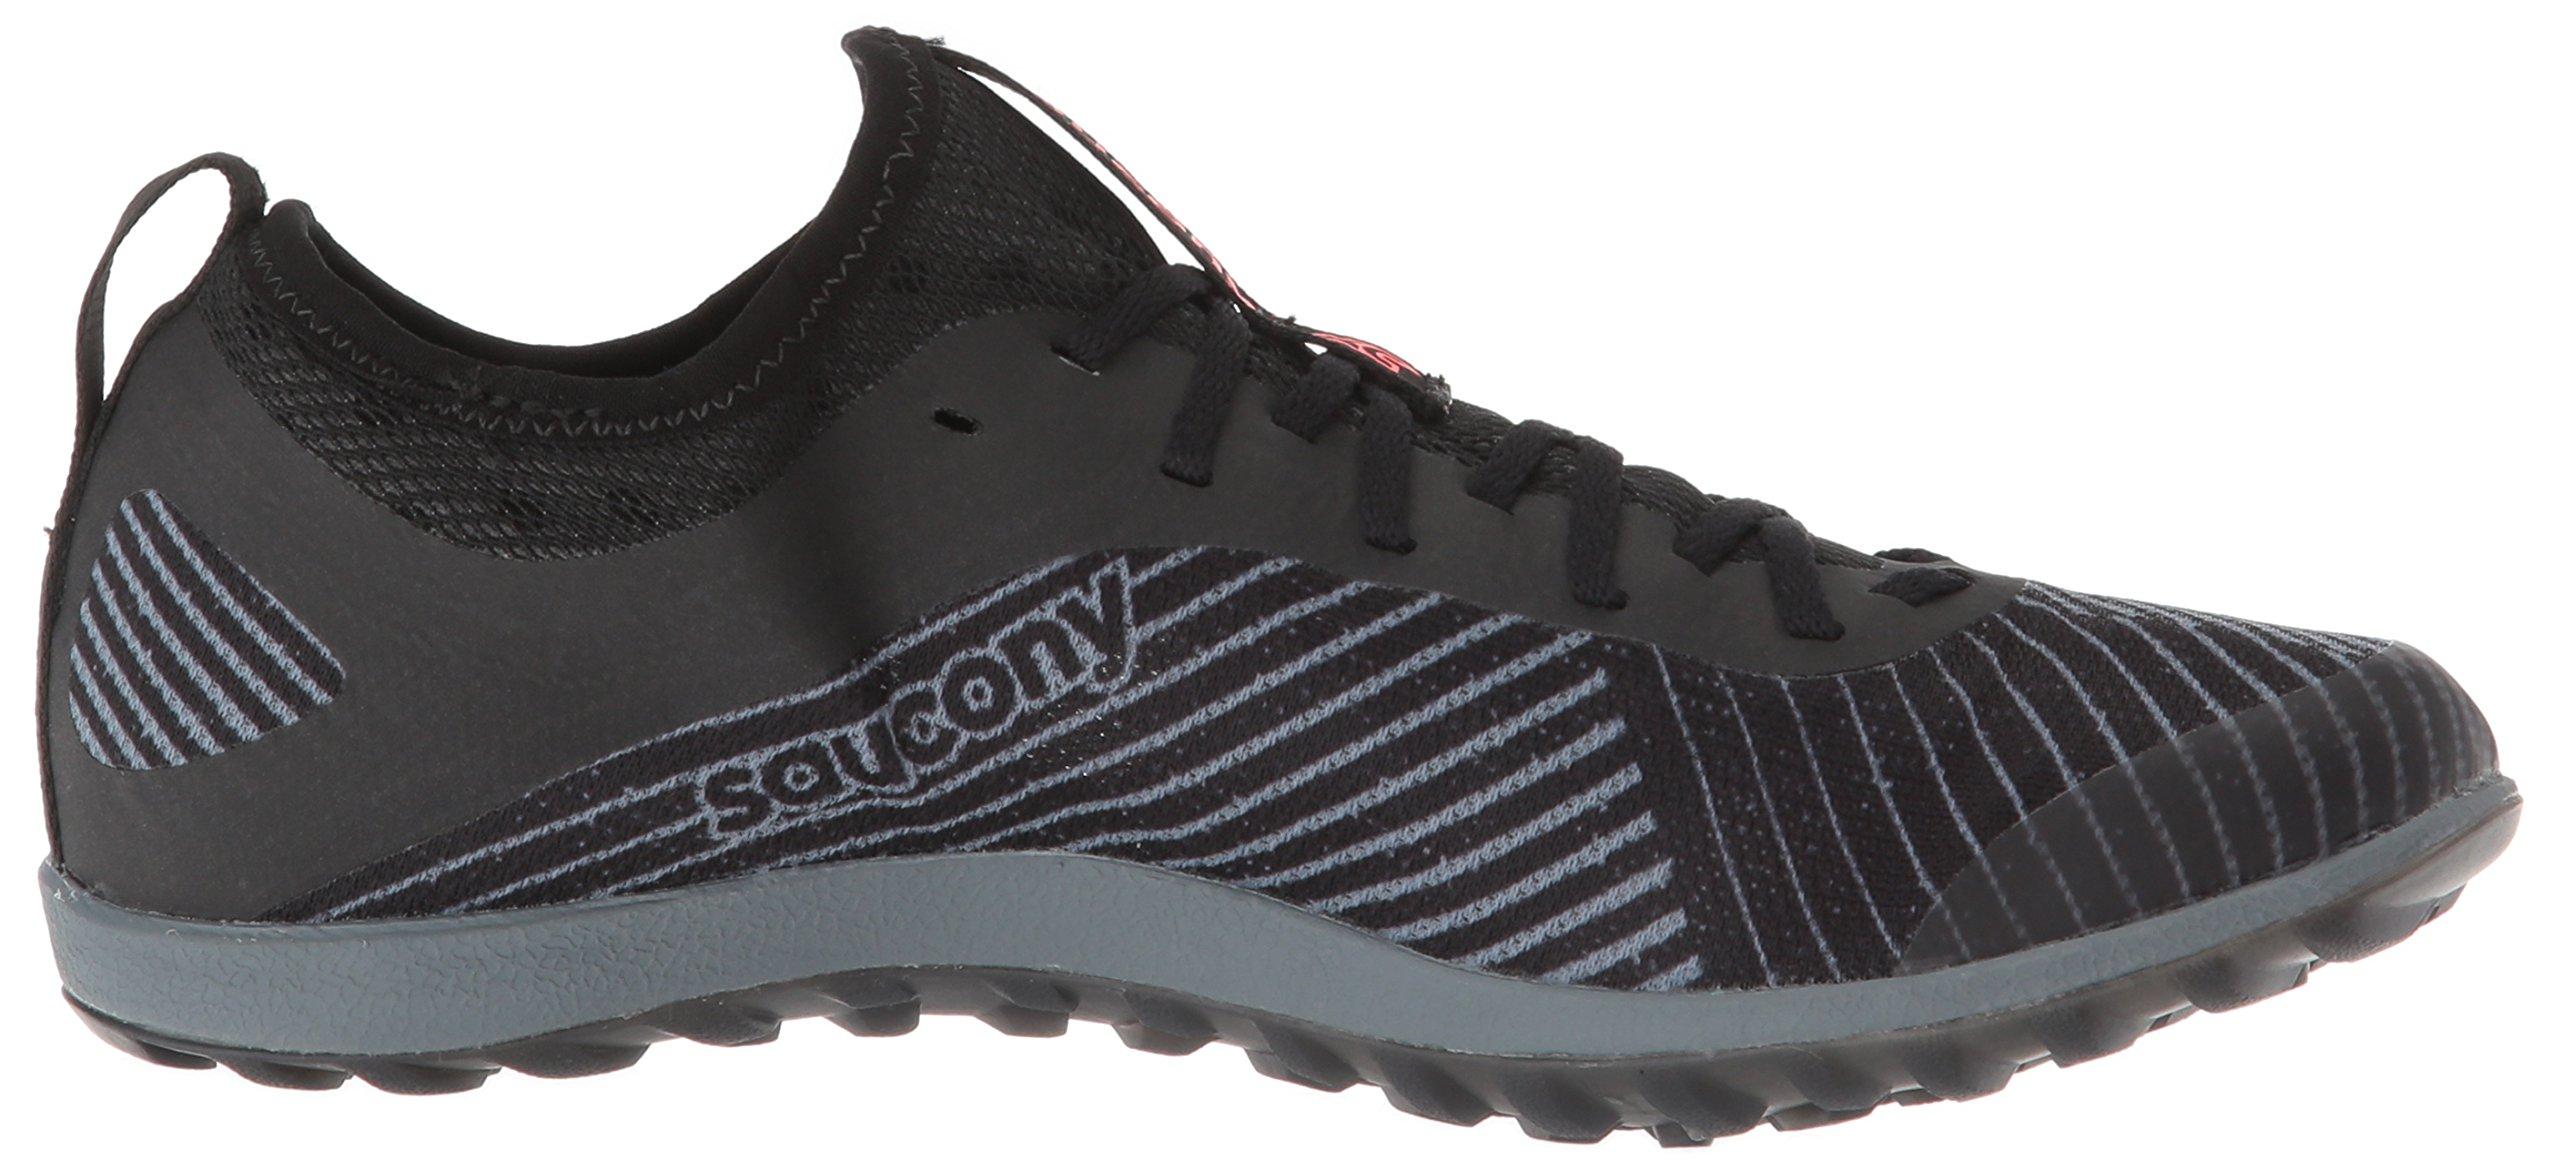 Saucony Women's Havok XC2 Flat Track Shoe Black/Grey/Vizi-red 7 M US by Saucony (Image #6)